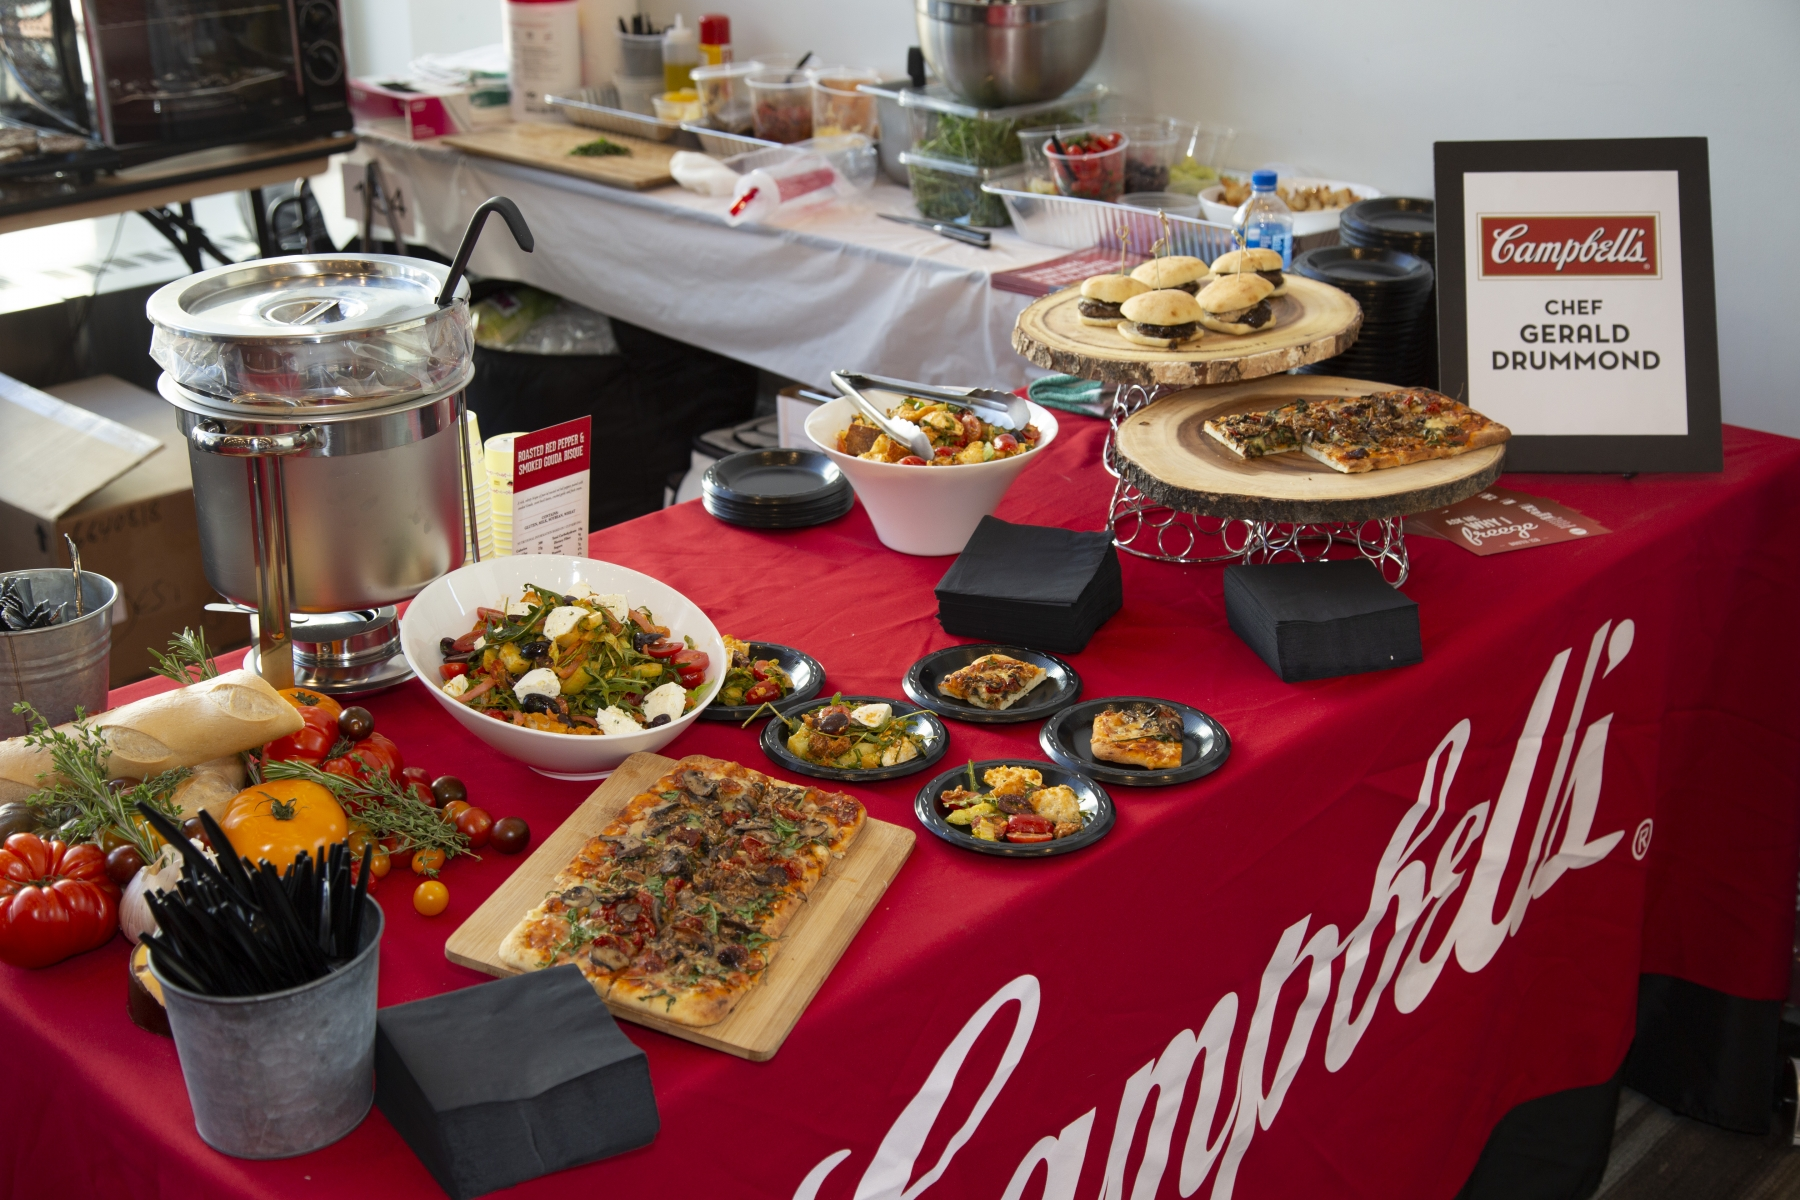 Food-Show-Campbells-Chef-Gerald-Drummond-Table-original